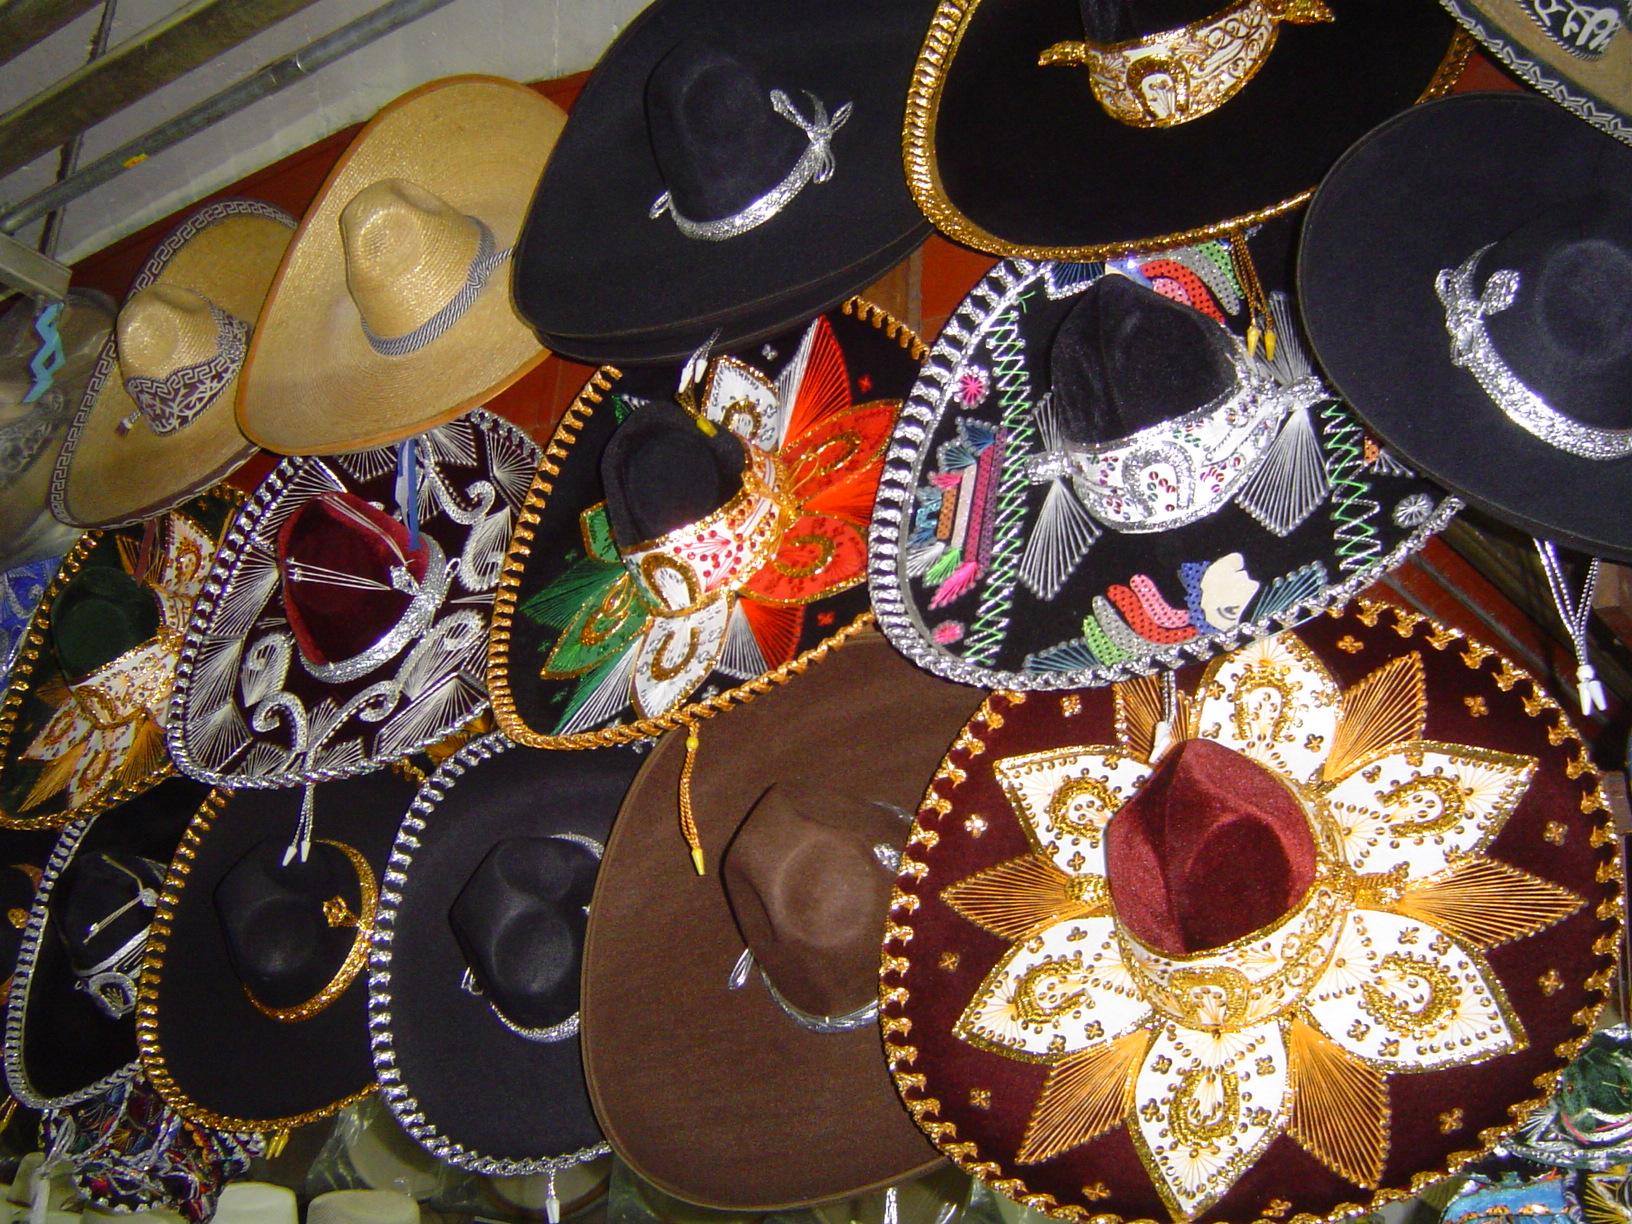 Sombreros, Mexico autor: patrick.denizet from wikipedia.org